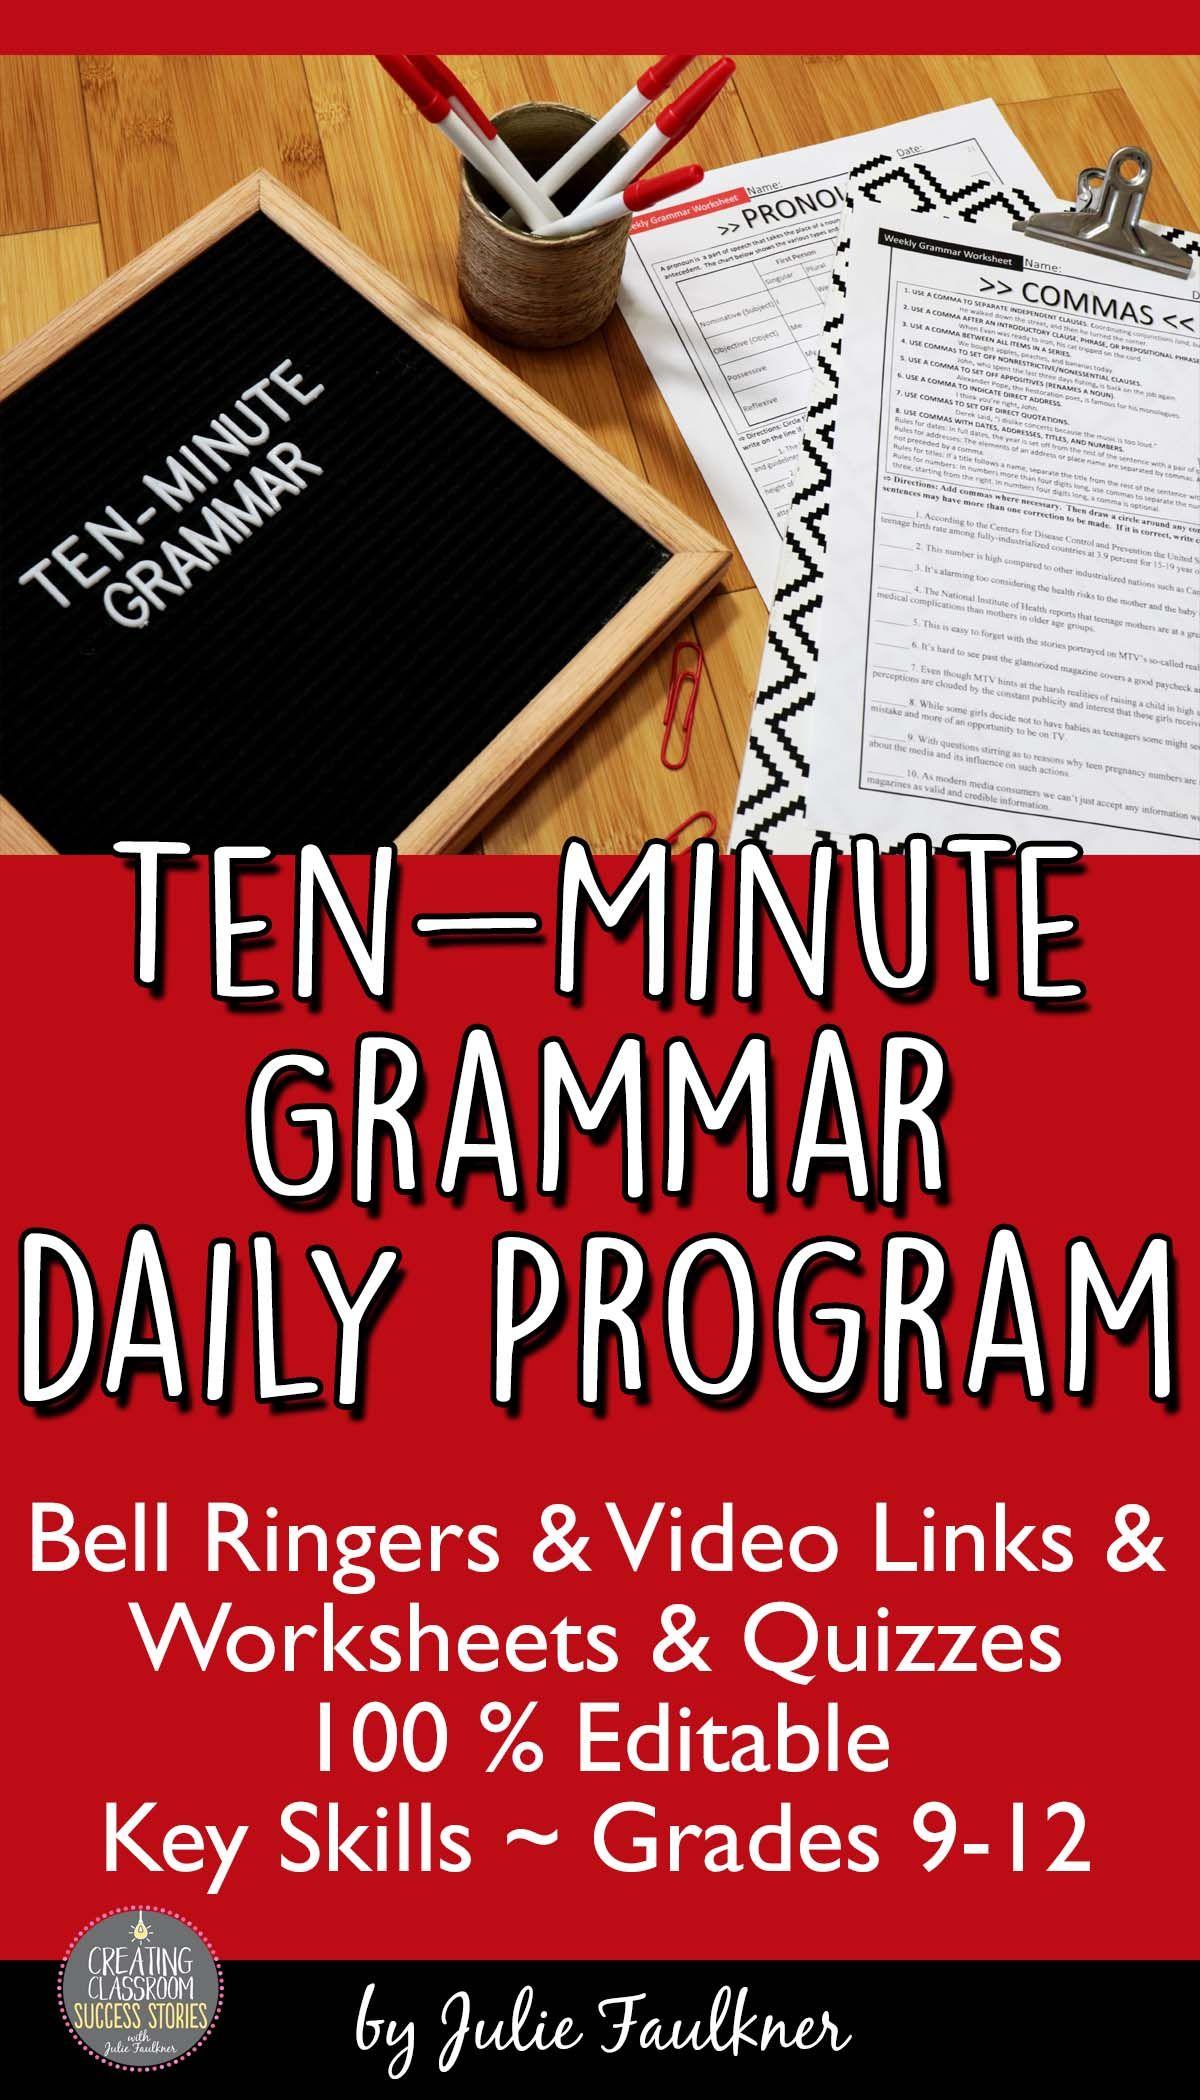 Ten Minute Grammar Daily Grammar Program High School Bell Ringers Video Links Worksheets Grammar Practice English Teacher High School Teaching High School [ 2100 x 1200 Pixel ]